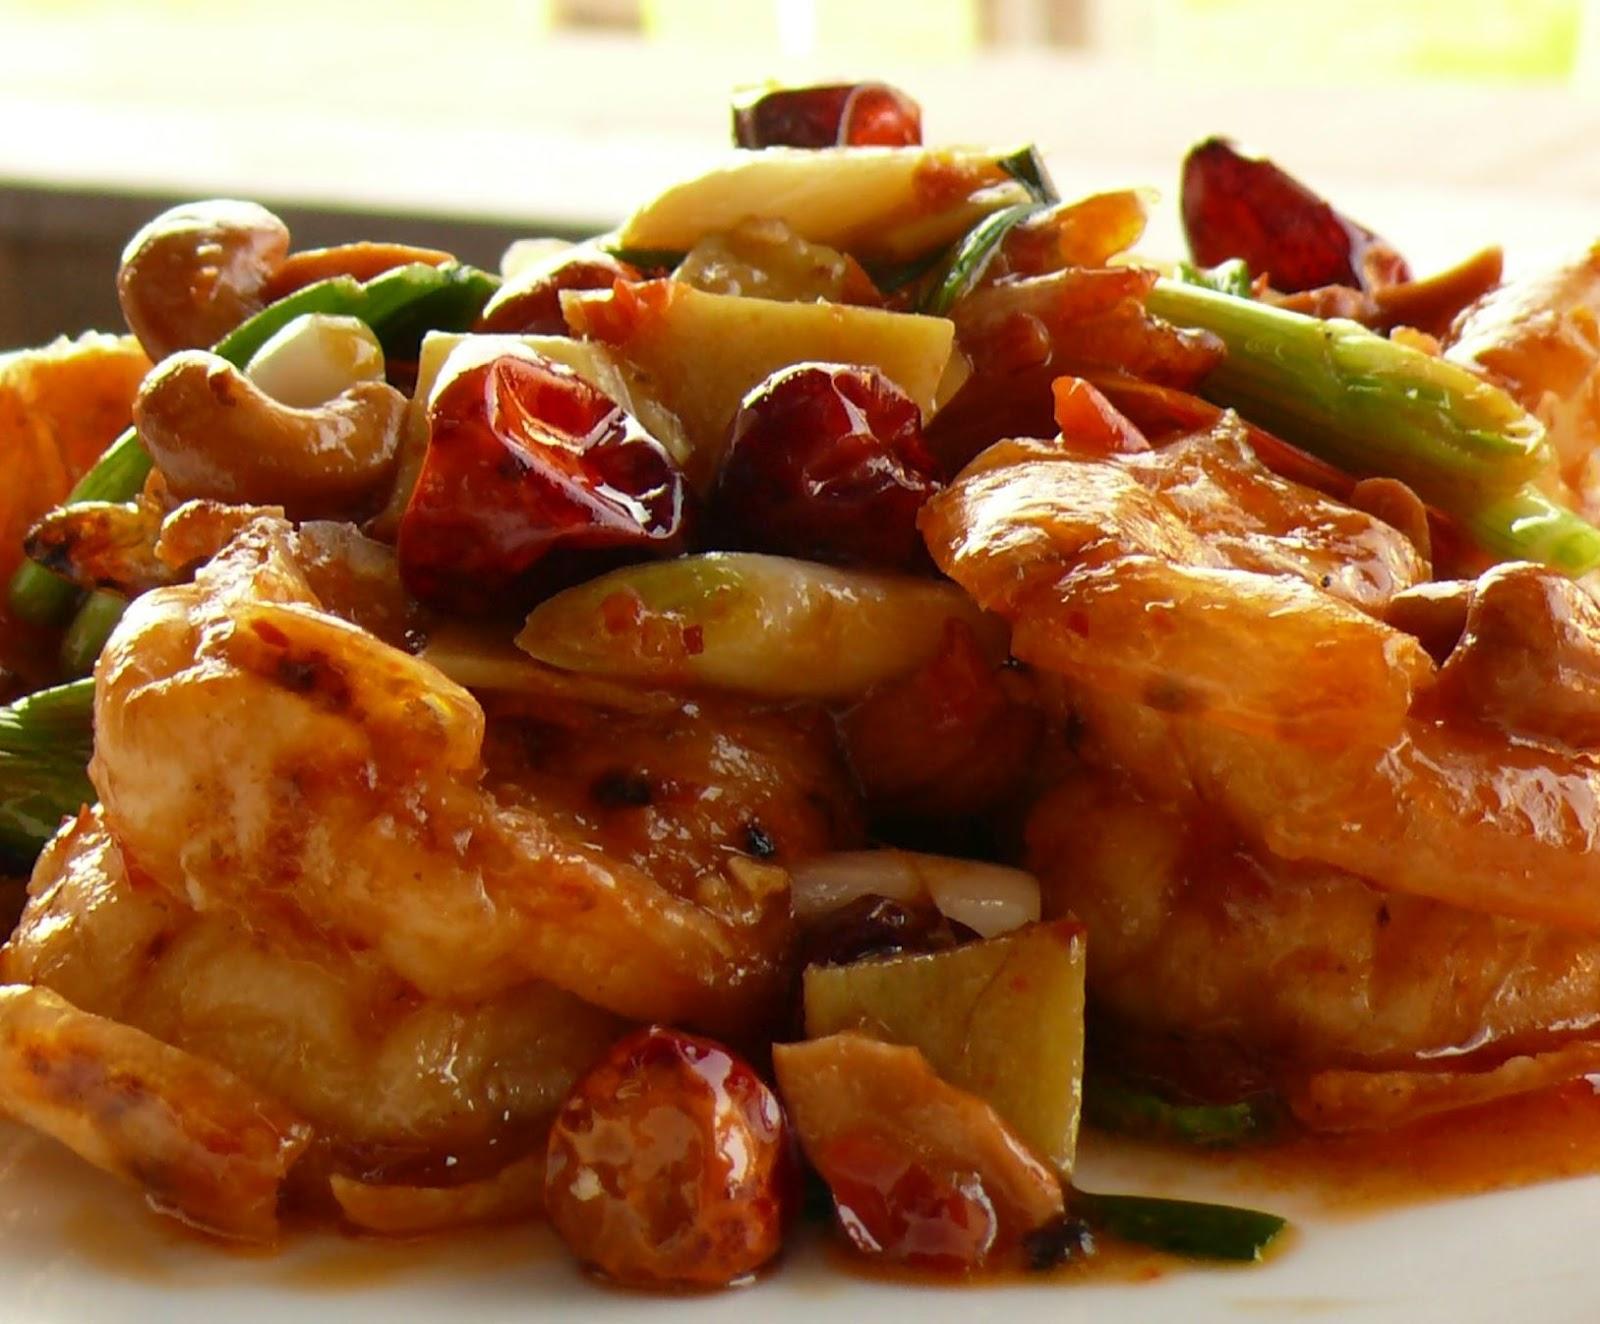 California Girl's Southern Fried Fusion: Sweet Chili Thai Shrimp